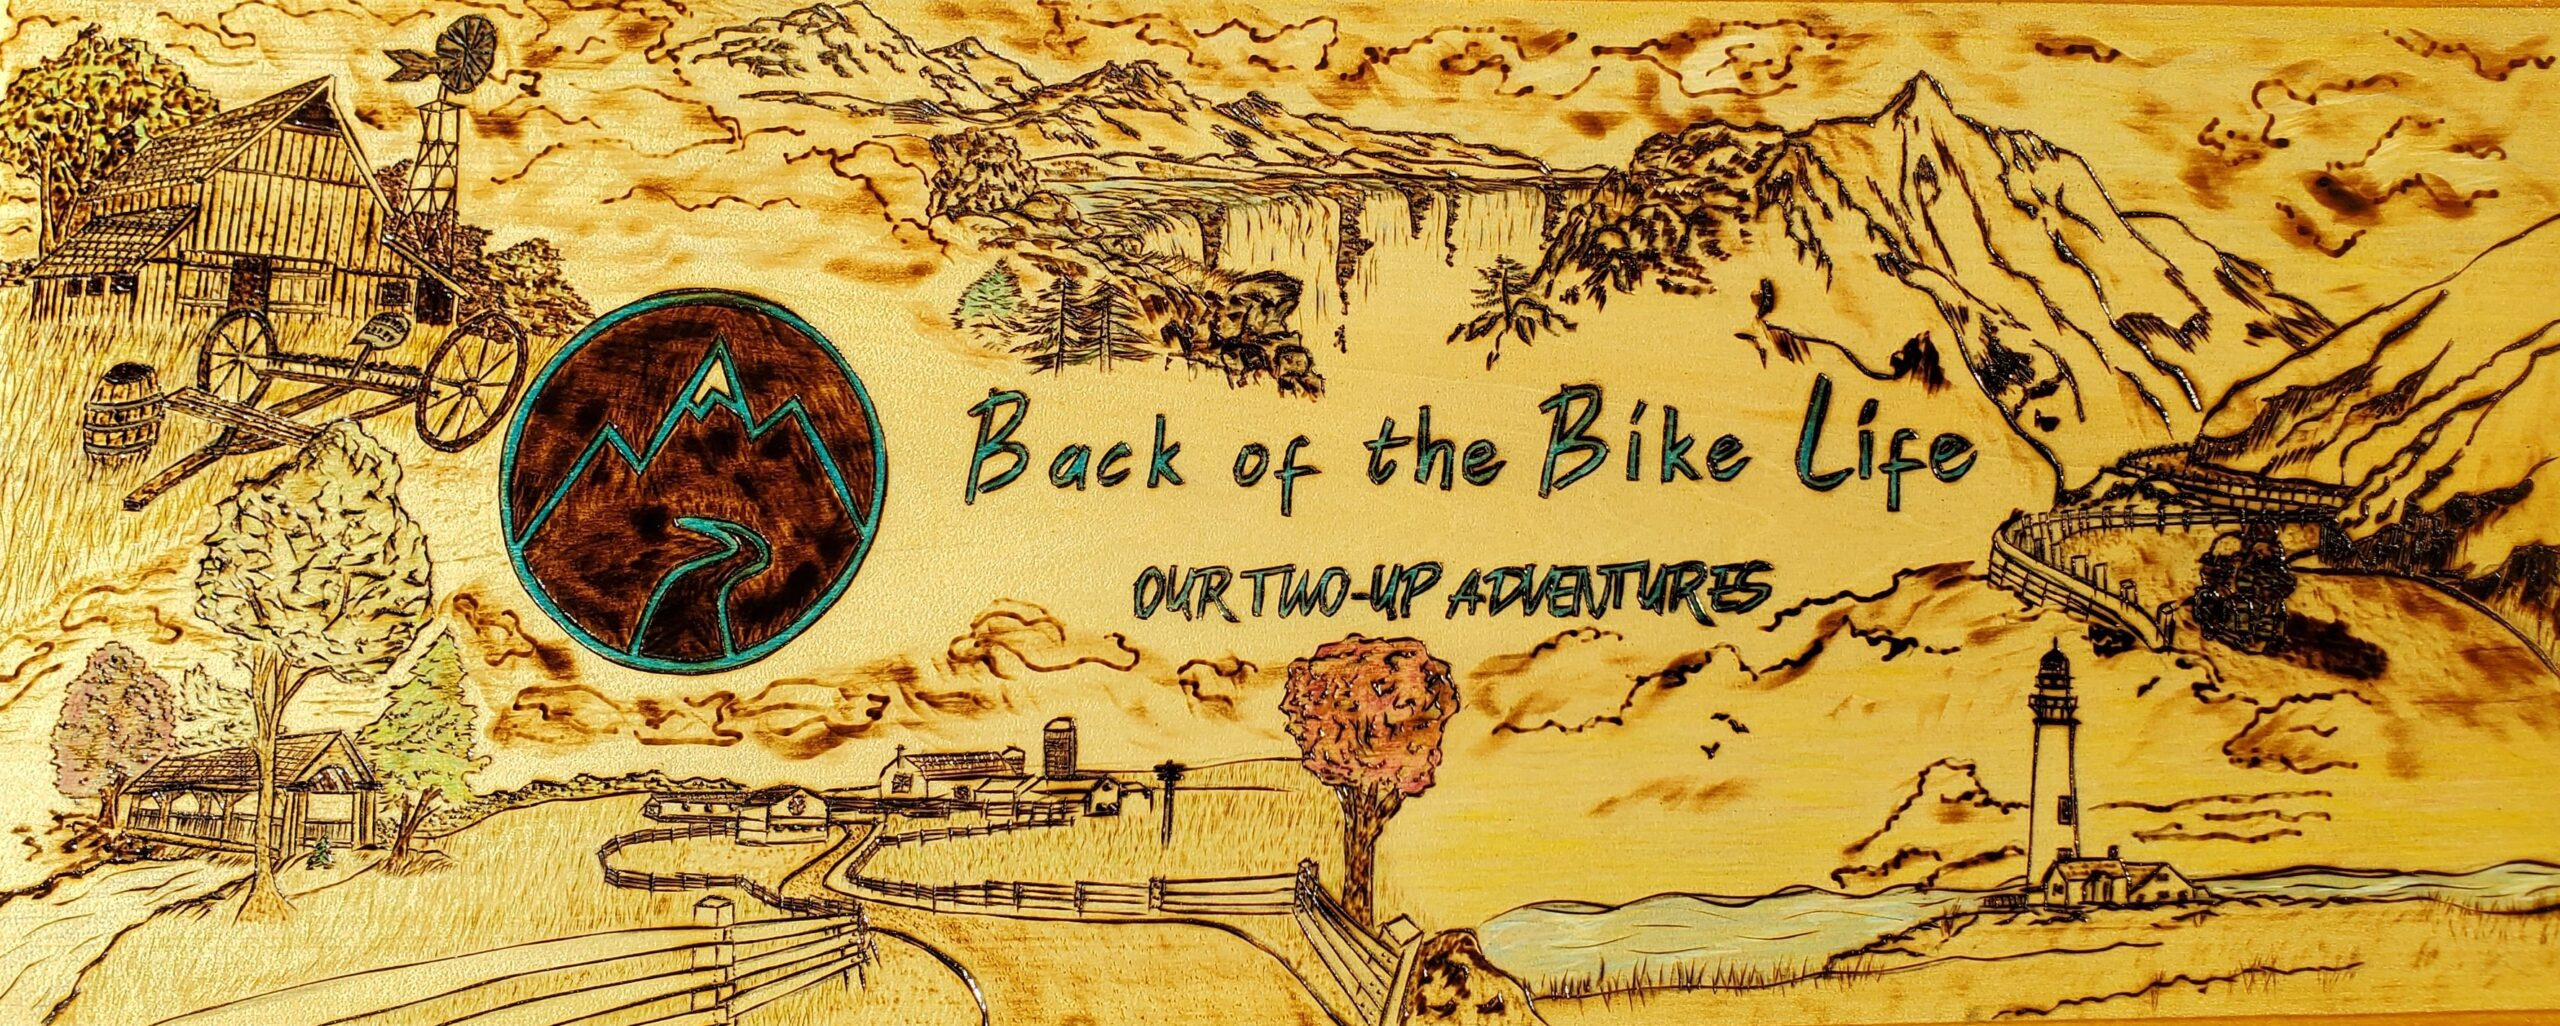 Back of the Bike Life